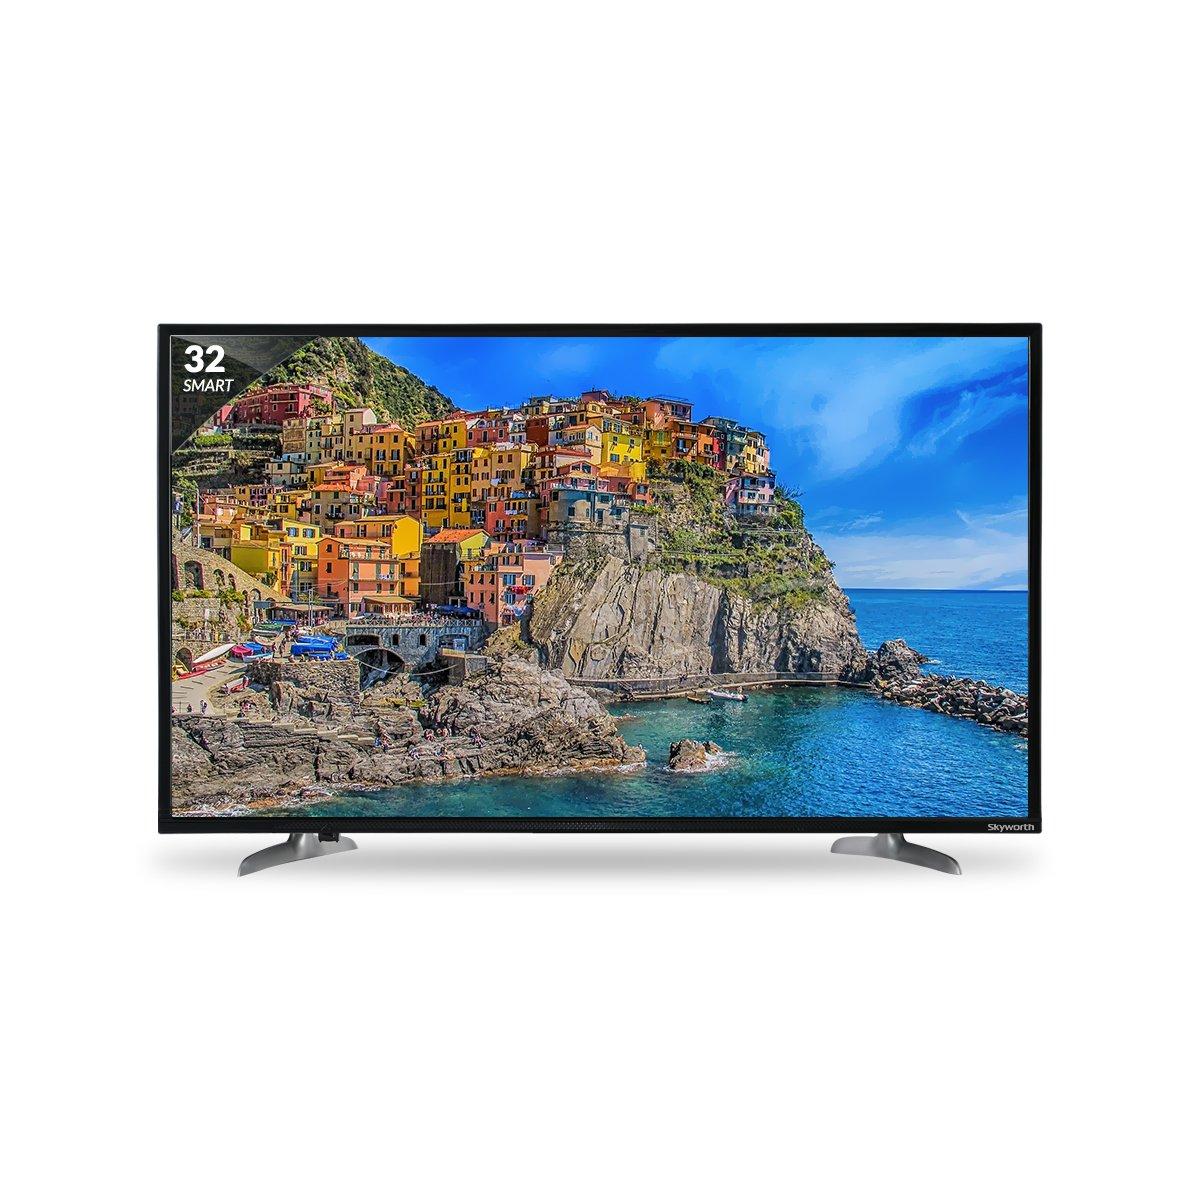 Skyworth LED TVs India - Skyworth 81.3 cm (32 inches) Smart 32 M20 HD Ready LED Smart TV